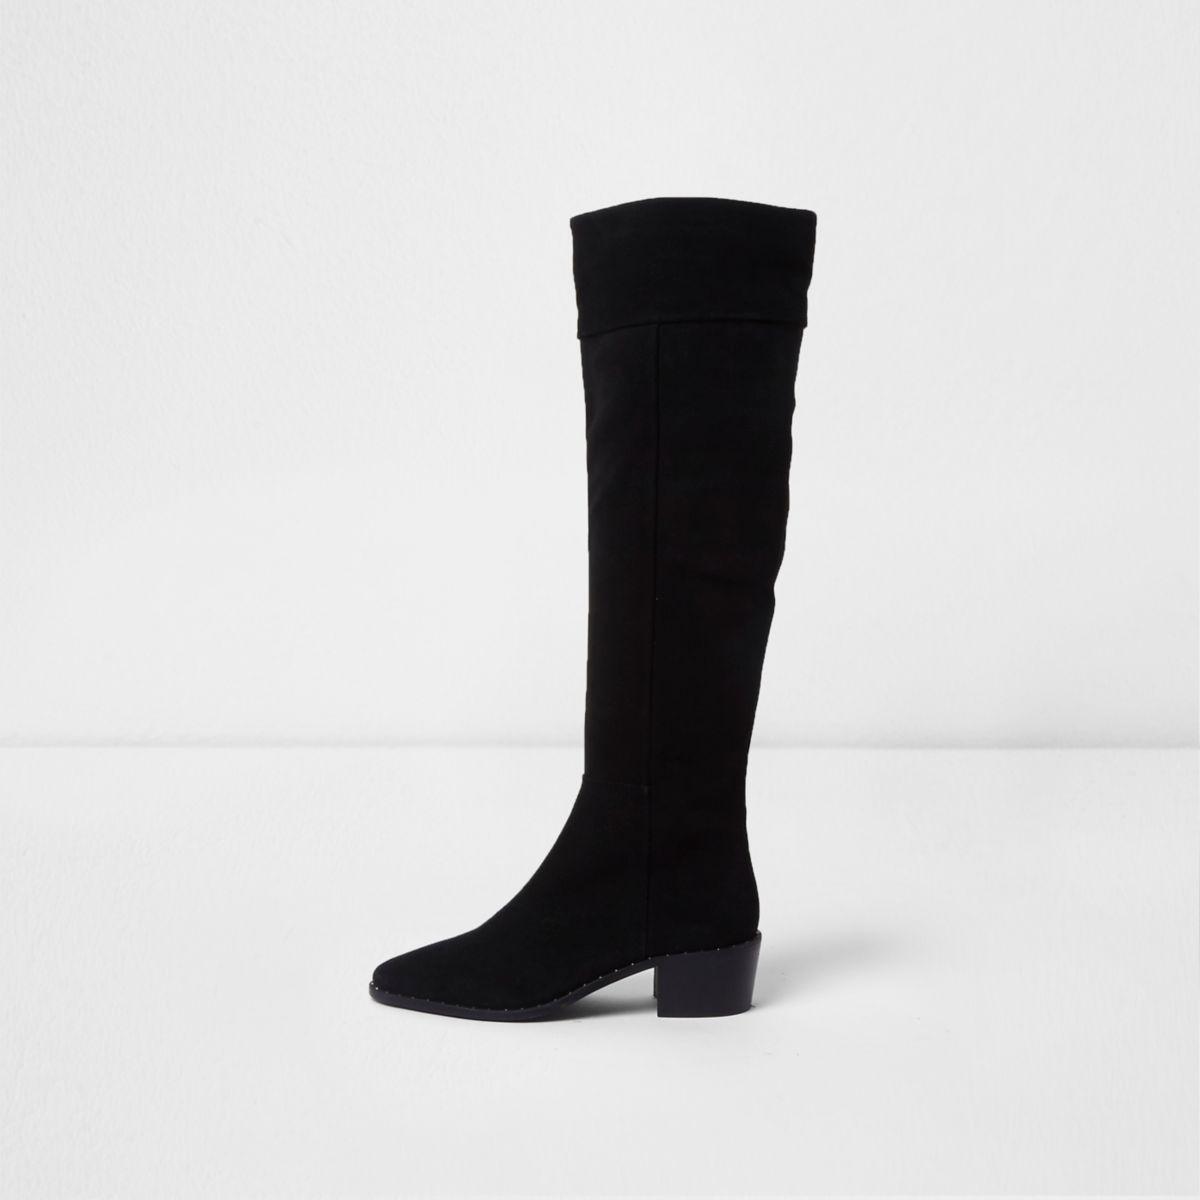 river island black suede slouch block heel knee high boots